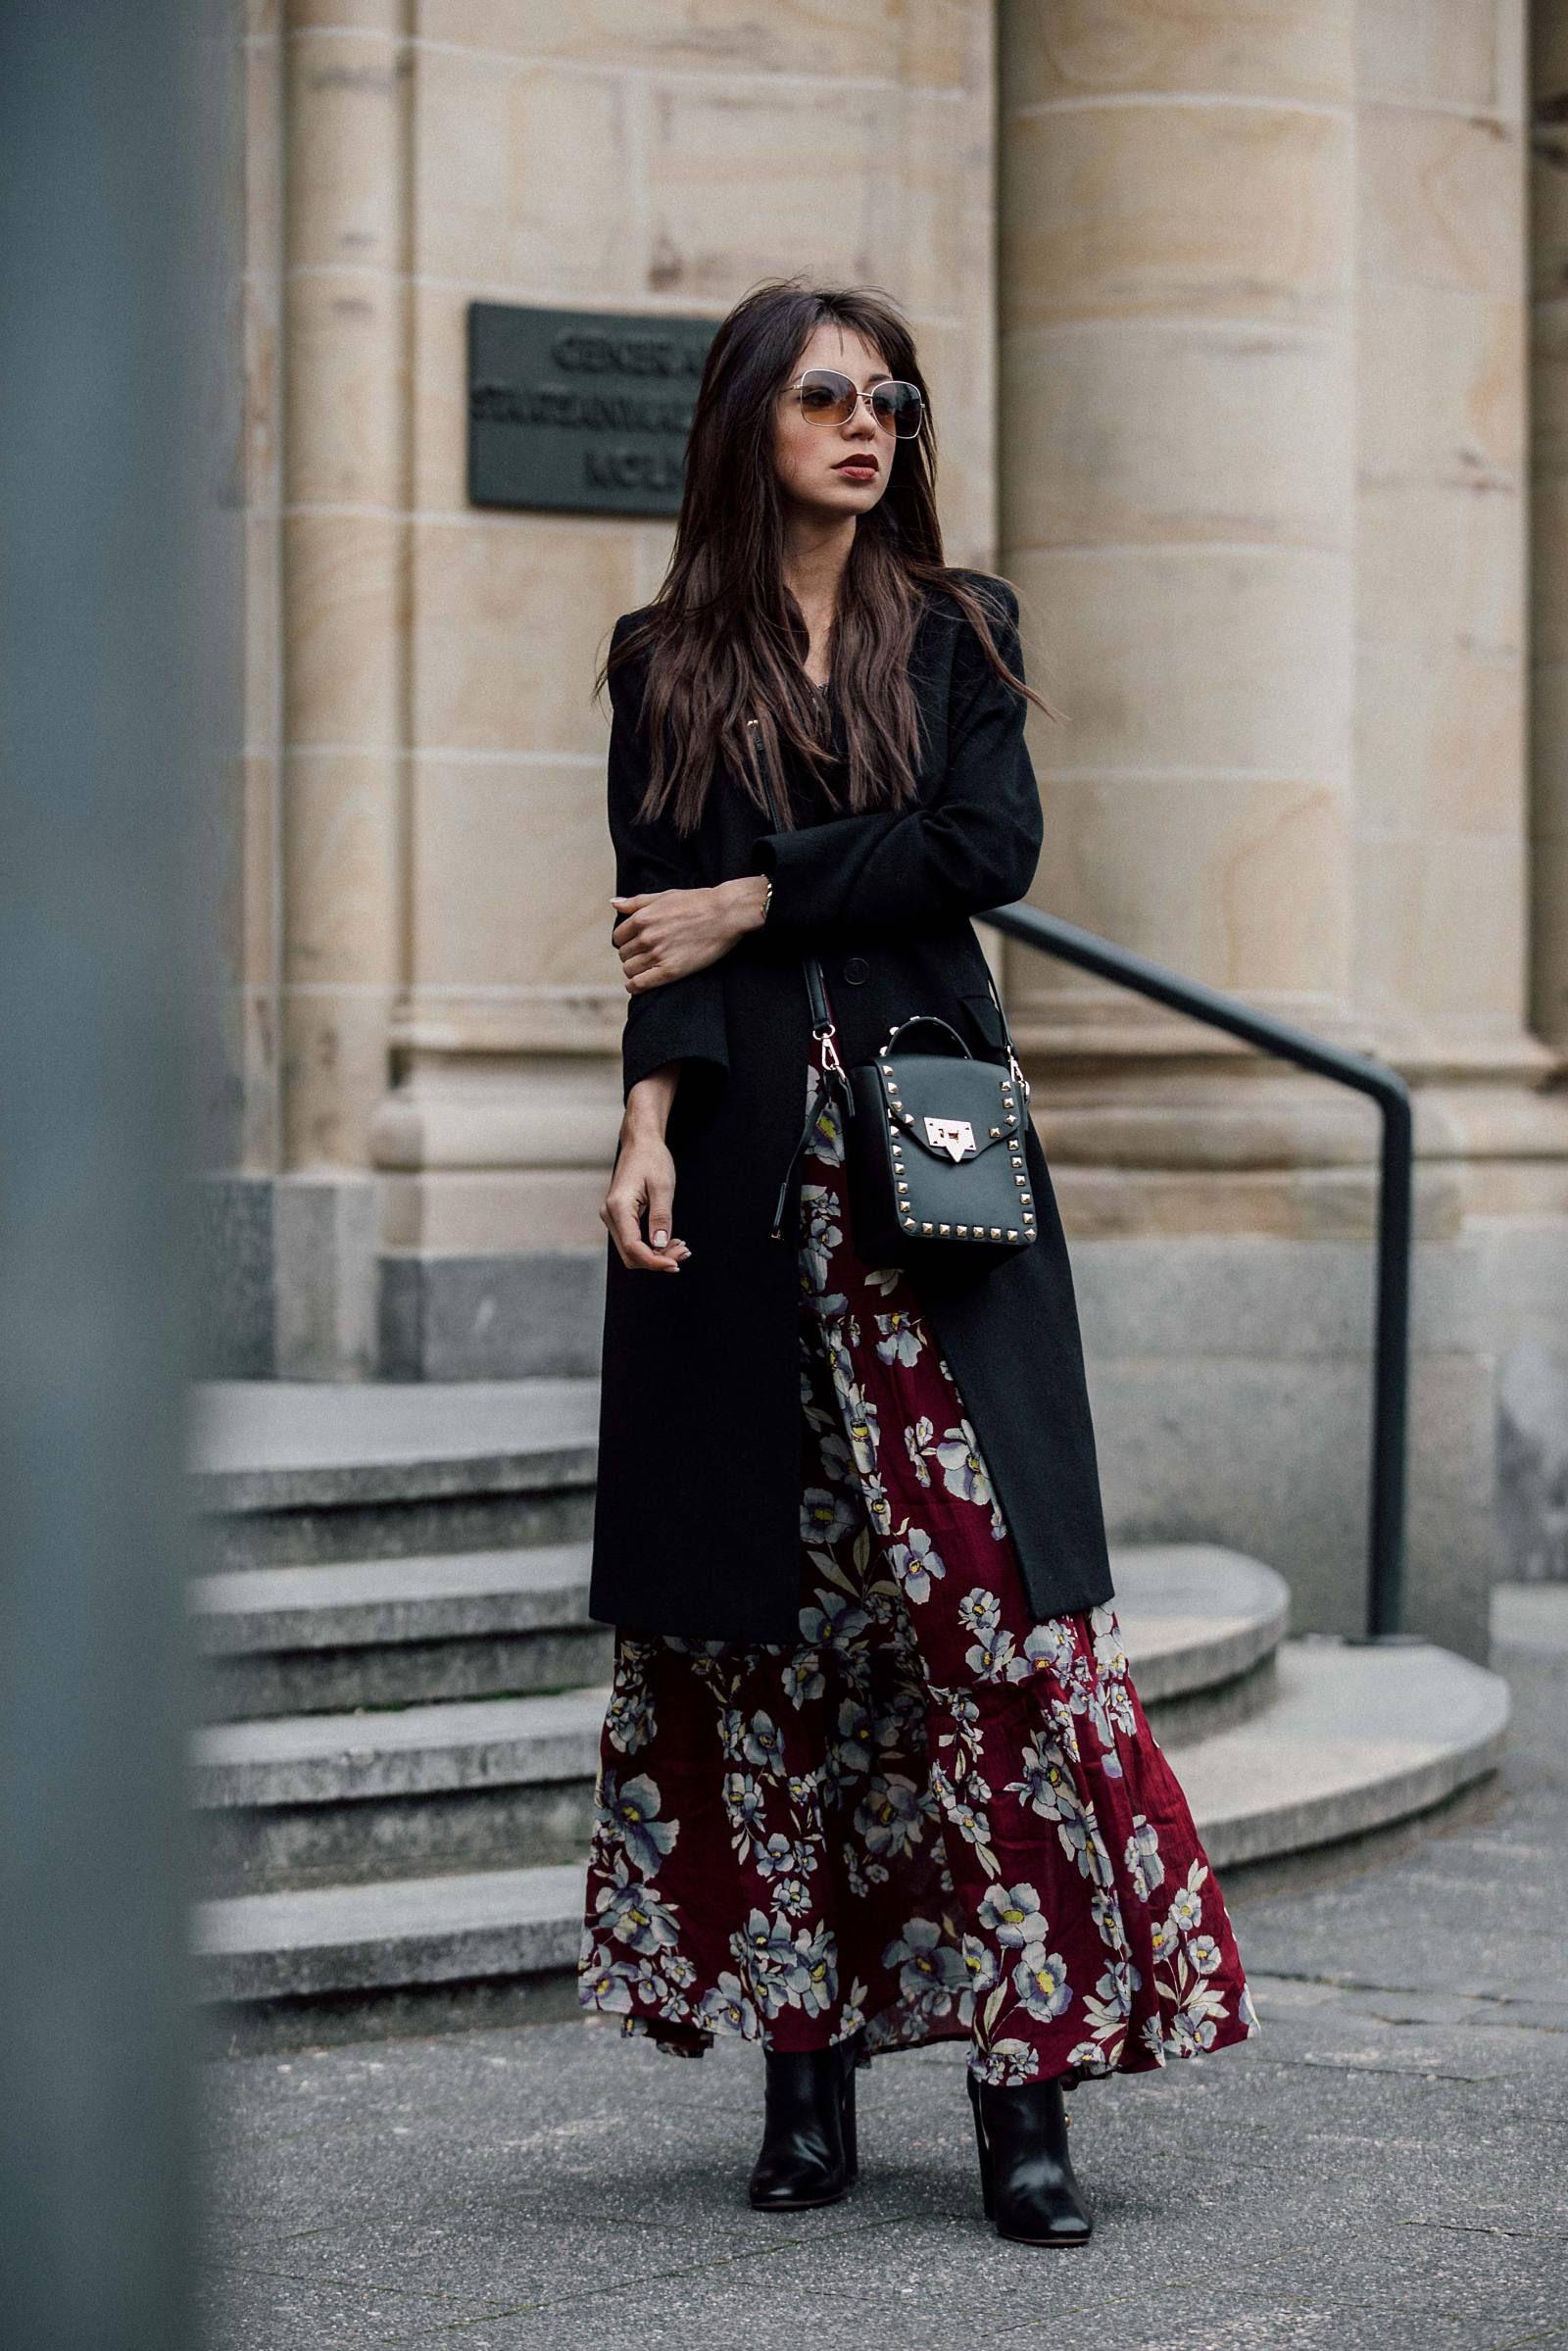 Photo of Pessoas Livres Maxi Dress / w Gucci Boots II Fashion Blog Alemanha 2018 I Style Blogg …